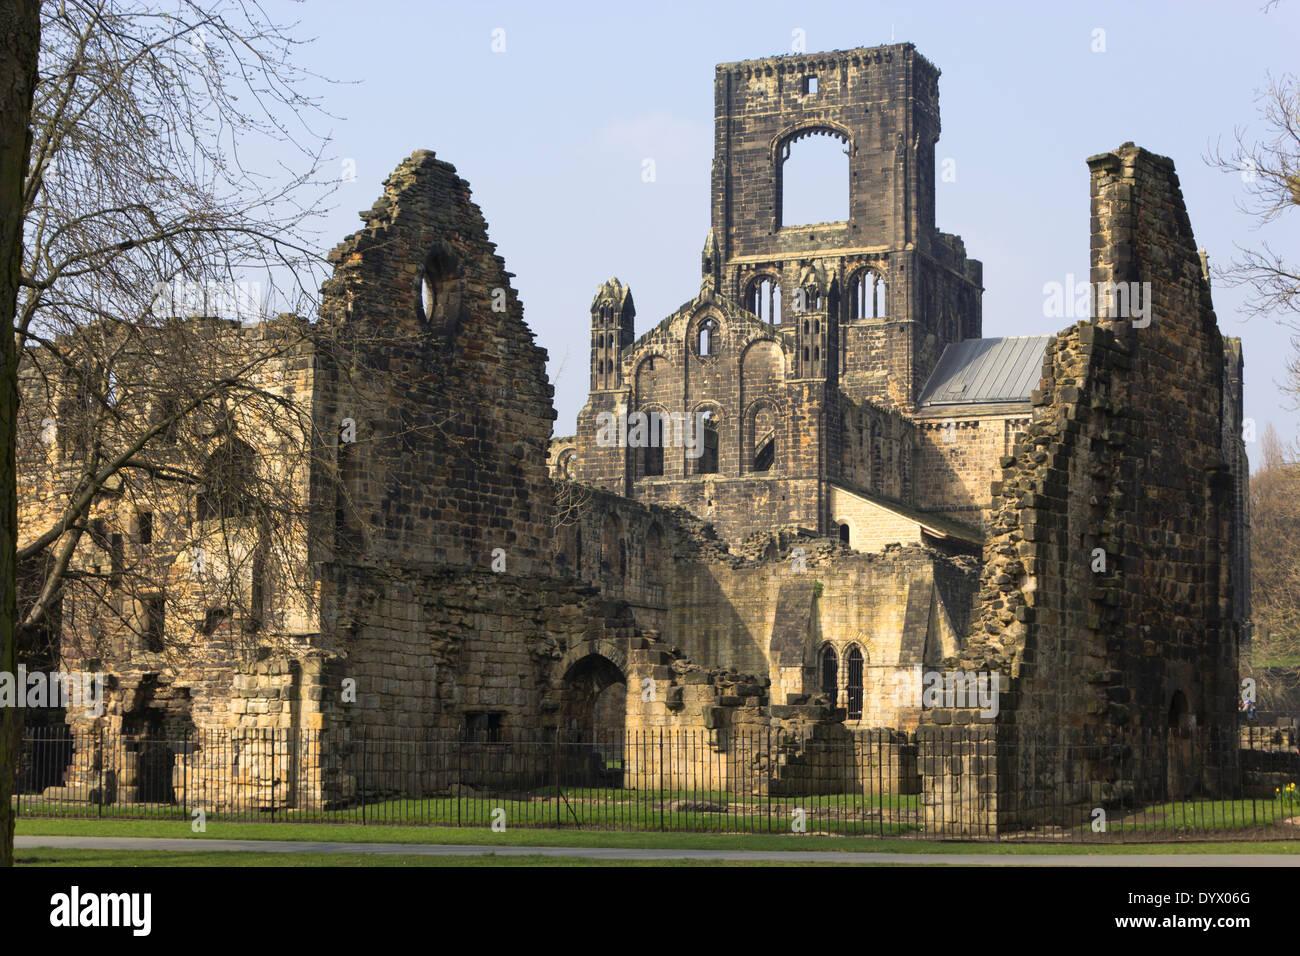 Kirkstall Abbey, Kirkstall , Leeds, West Yorkshire, England. A 12th century ruined Cistercian monastery. - Stock Image